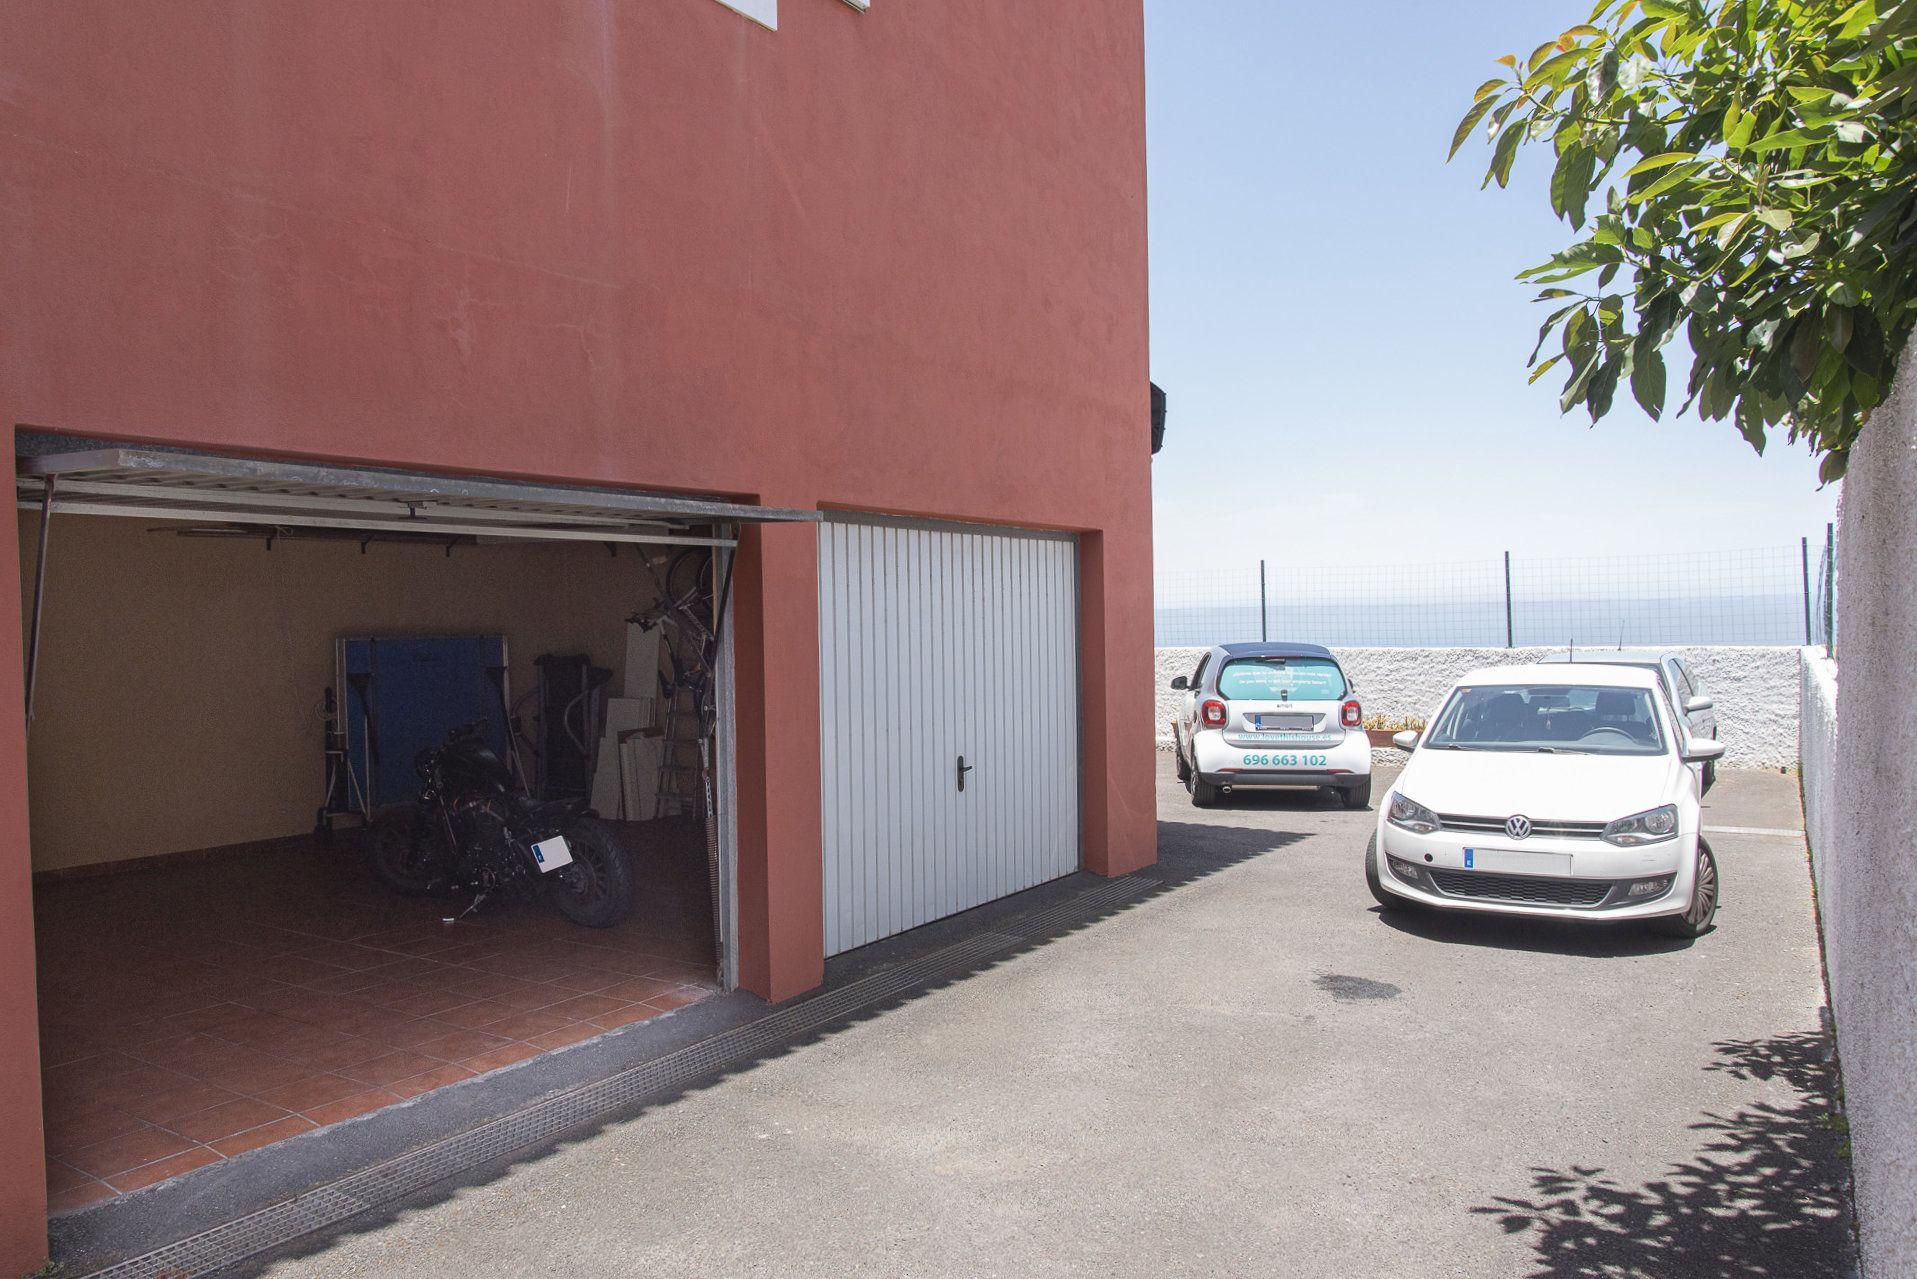 San Nicolás - garaje exterior